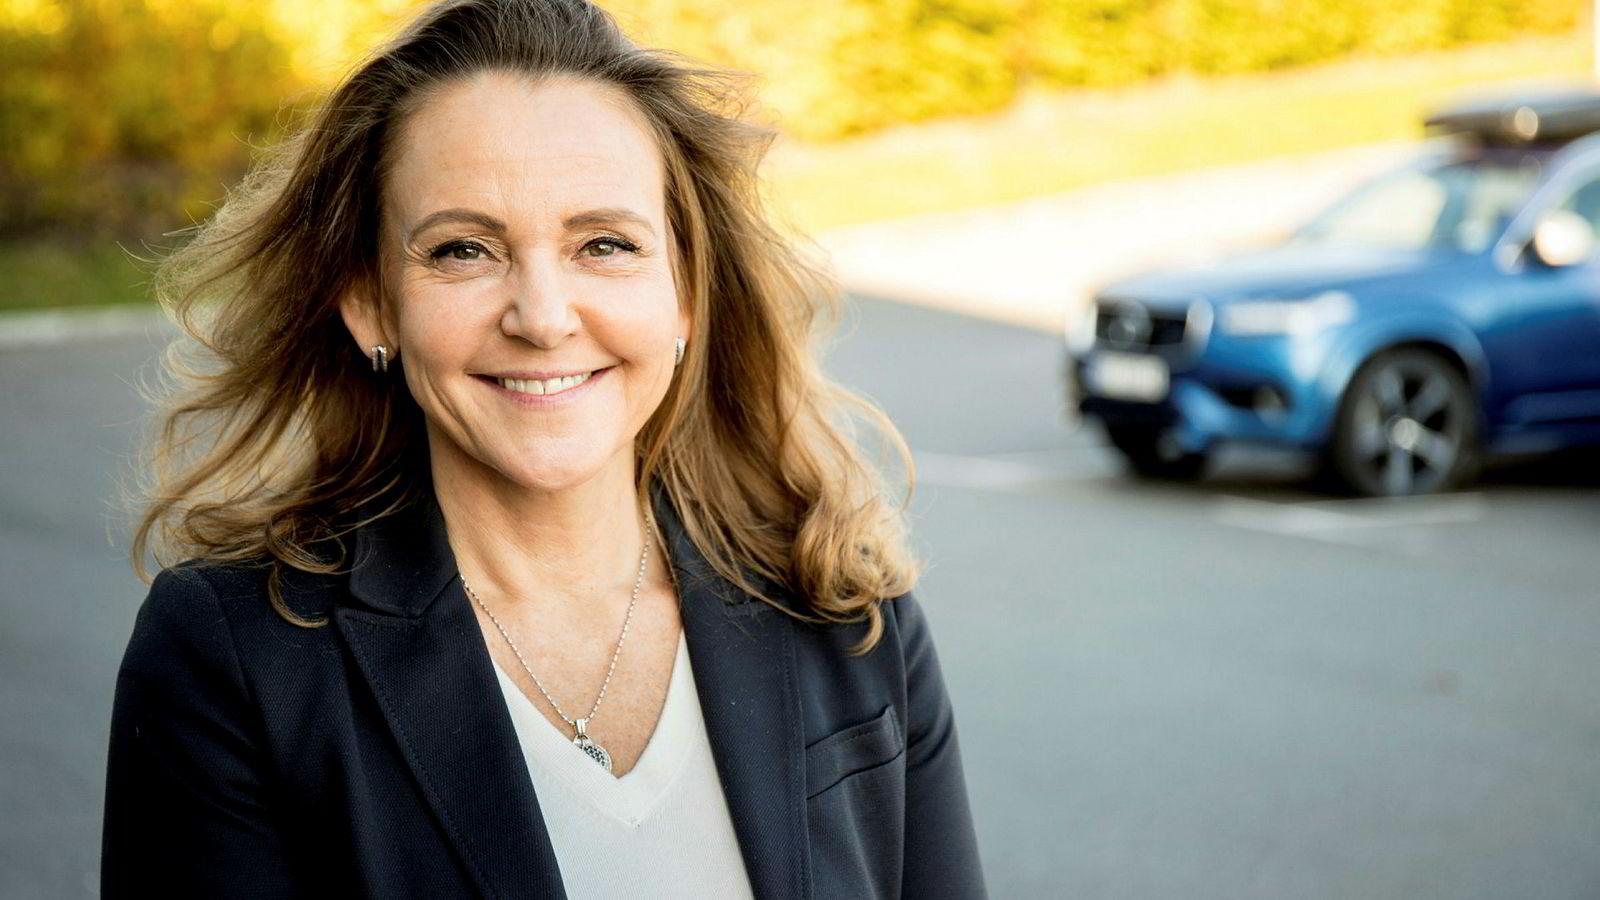 Rita Kristin Broch tar over som sjef for Volvo Cars Norway. Hun kommer fra Diplom-Is